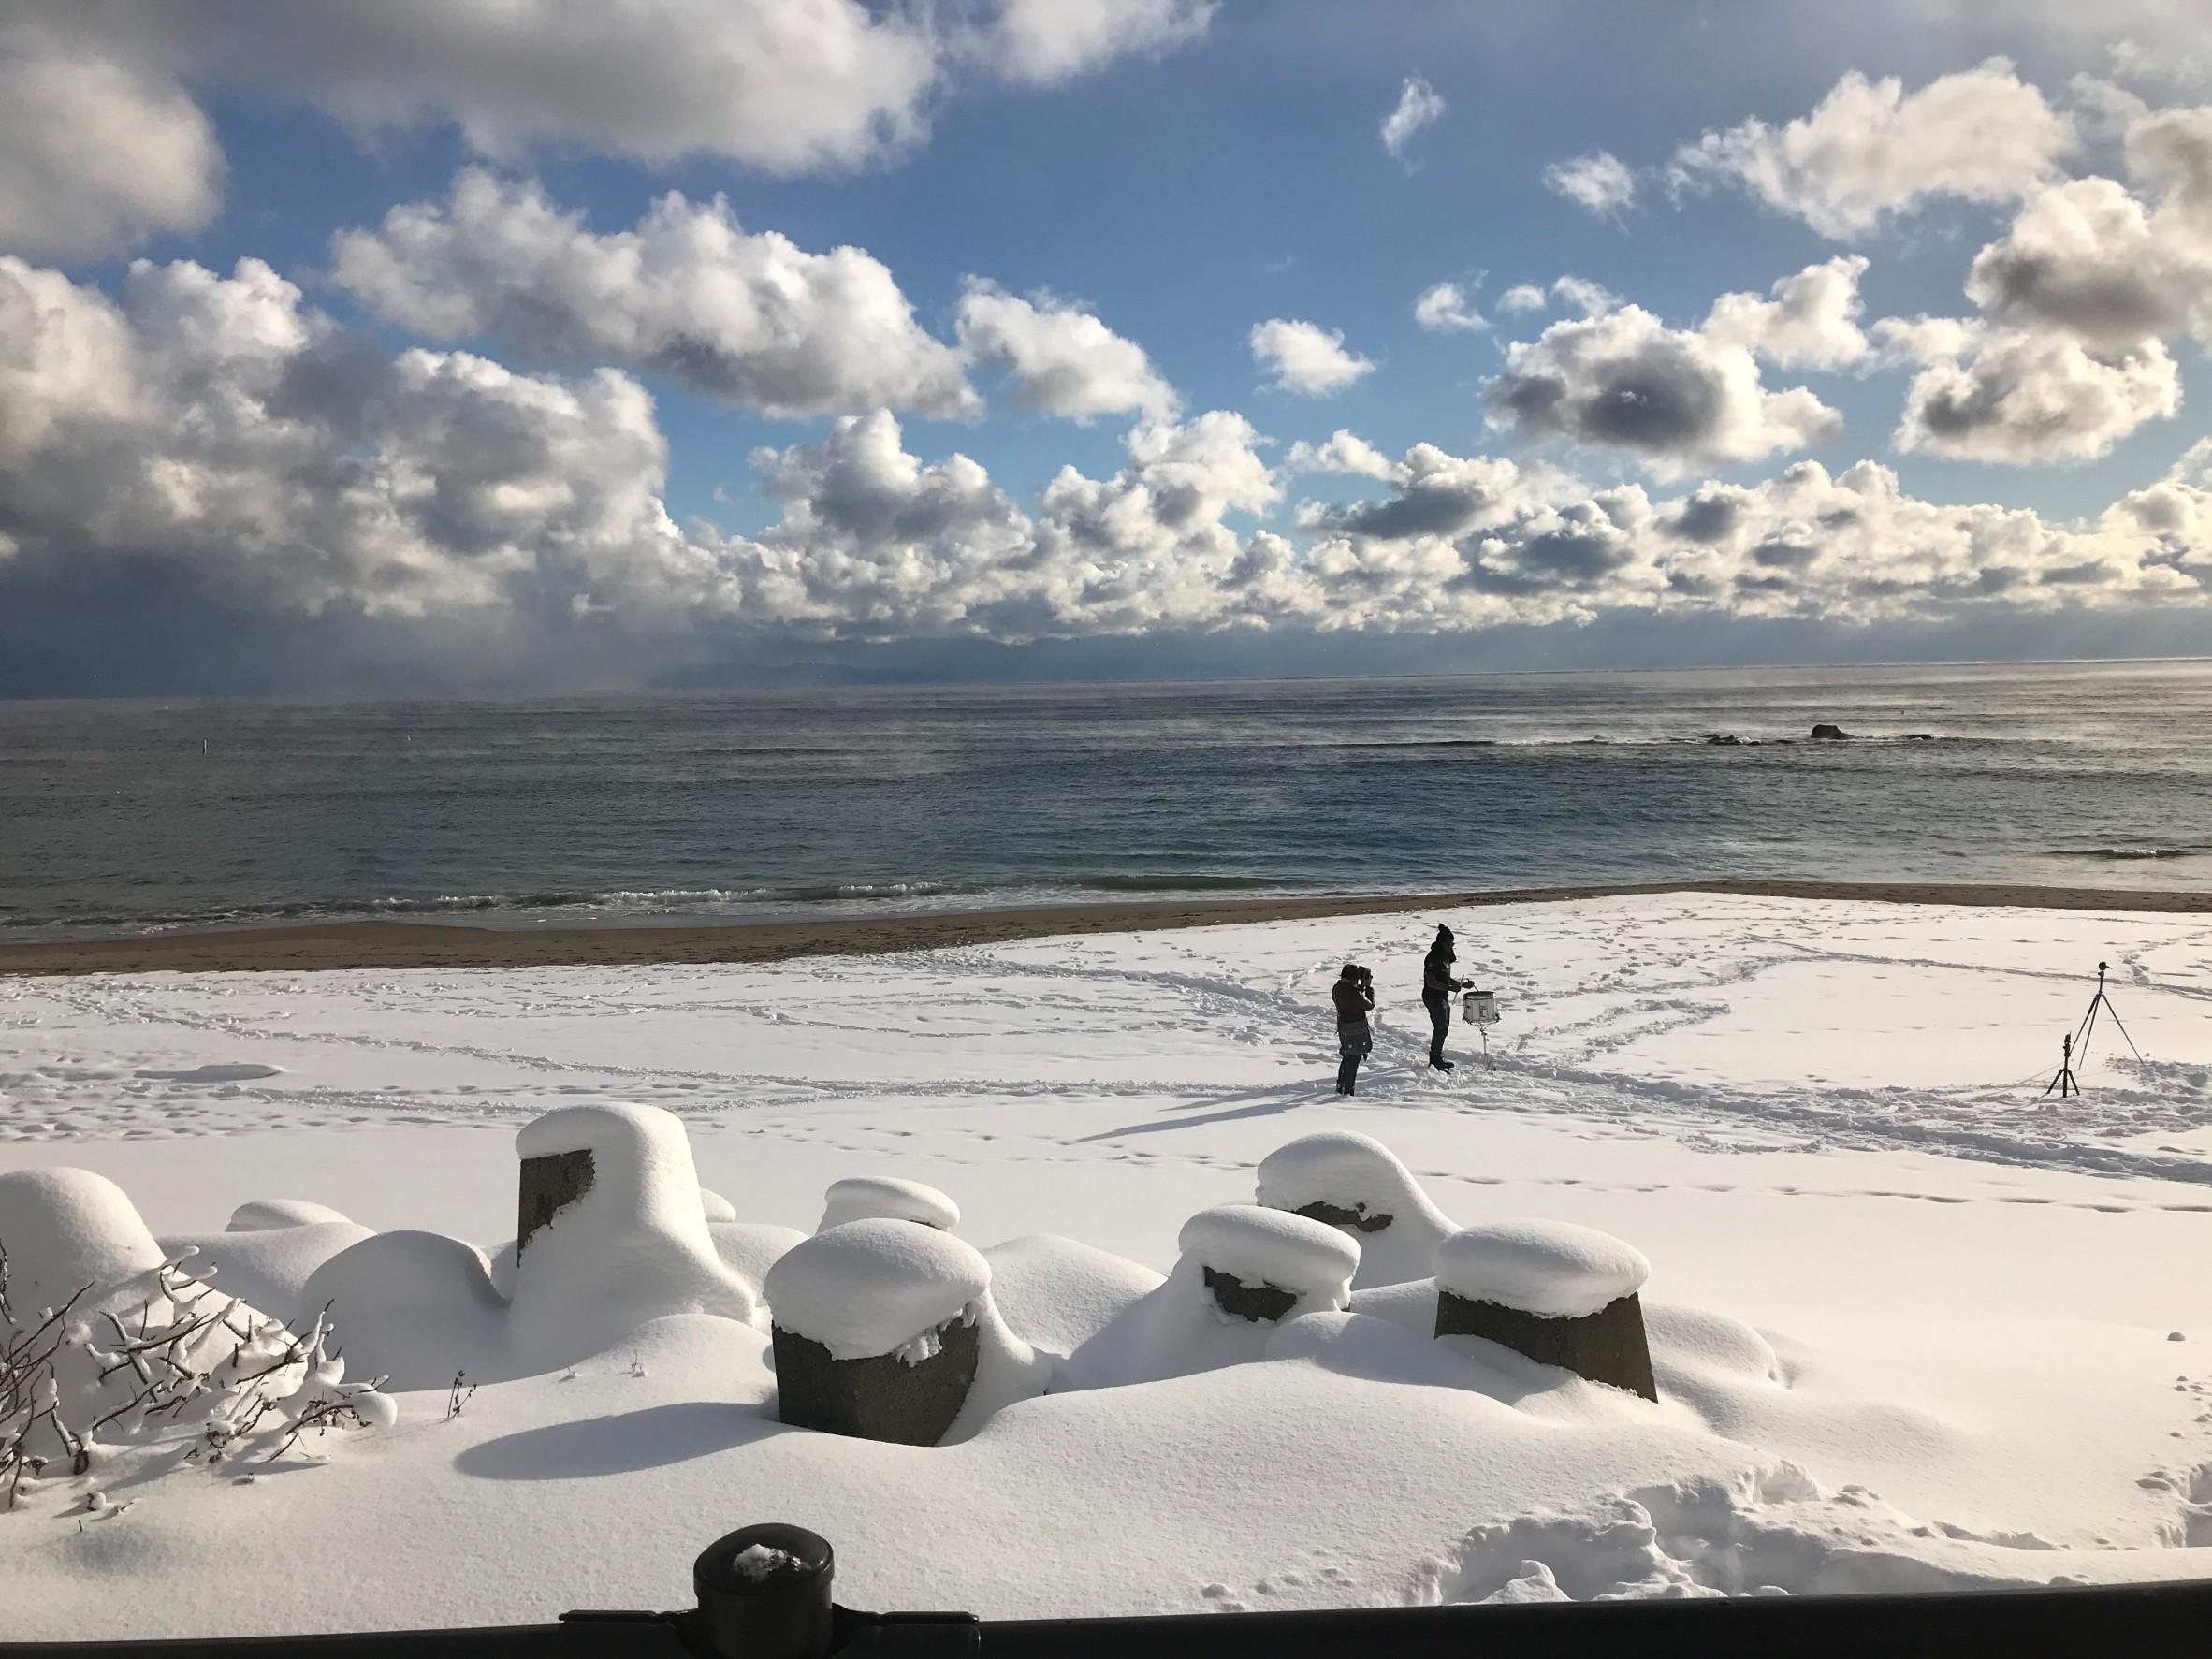 函館 湯川の海岸